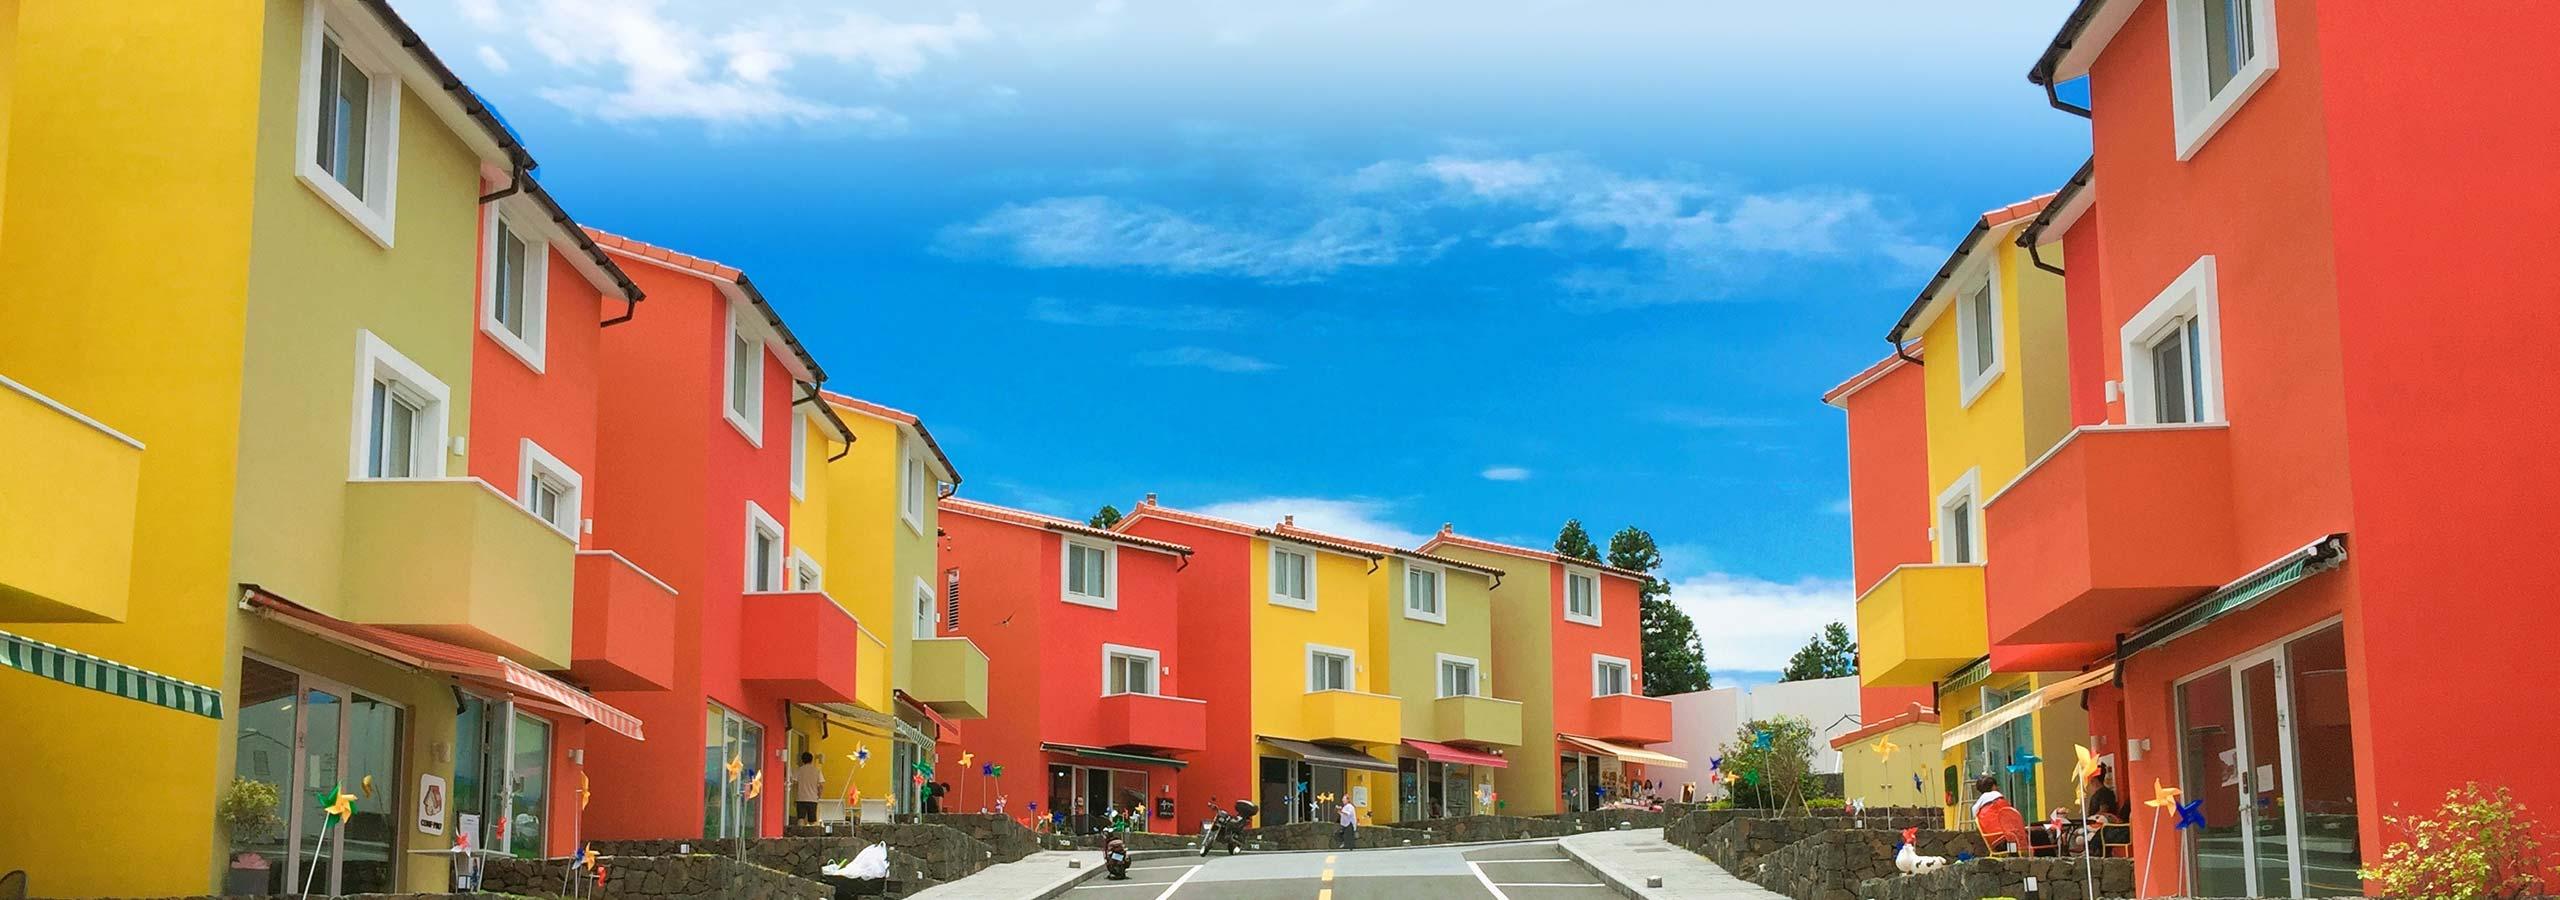 Foto: Brightly colored houses road © Park Dasol / Unsplash - https://unsplash.com/photos/hHdHCfAifHU